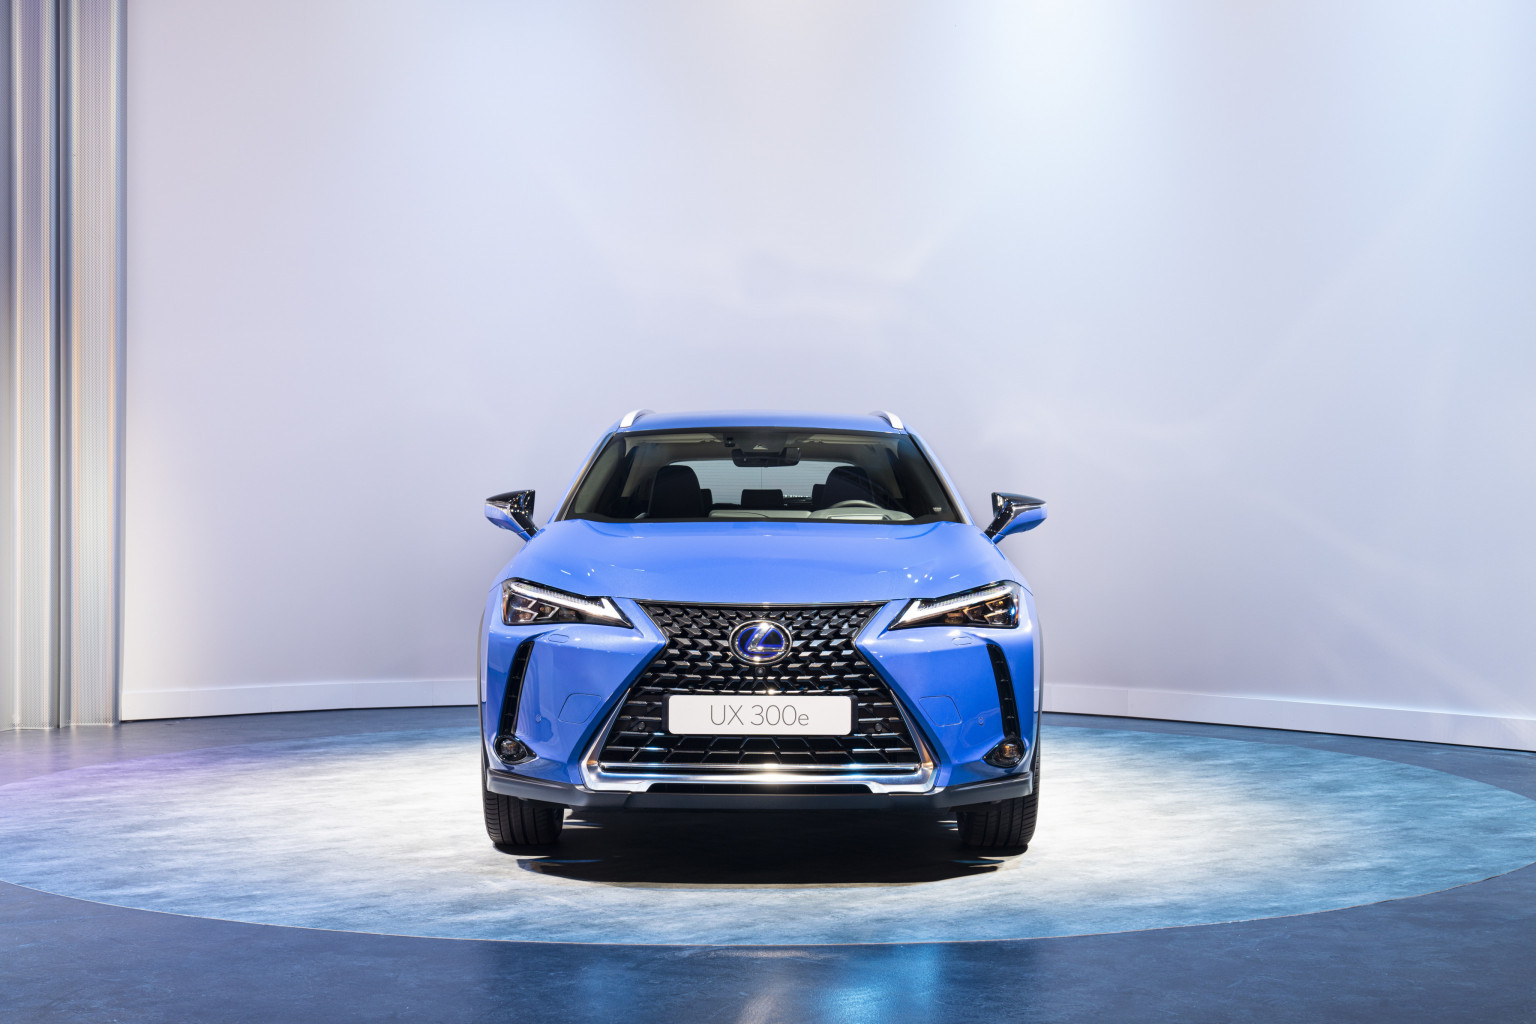 Lexus-UX-300e-UX300e-europe-1